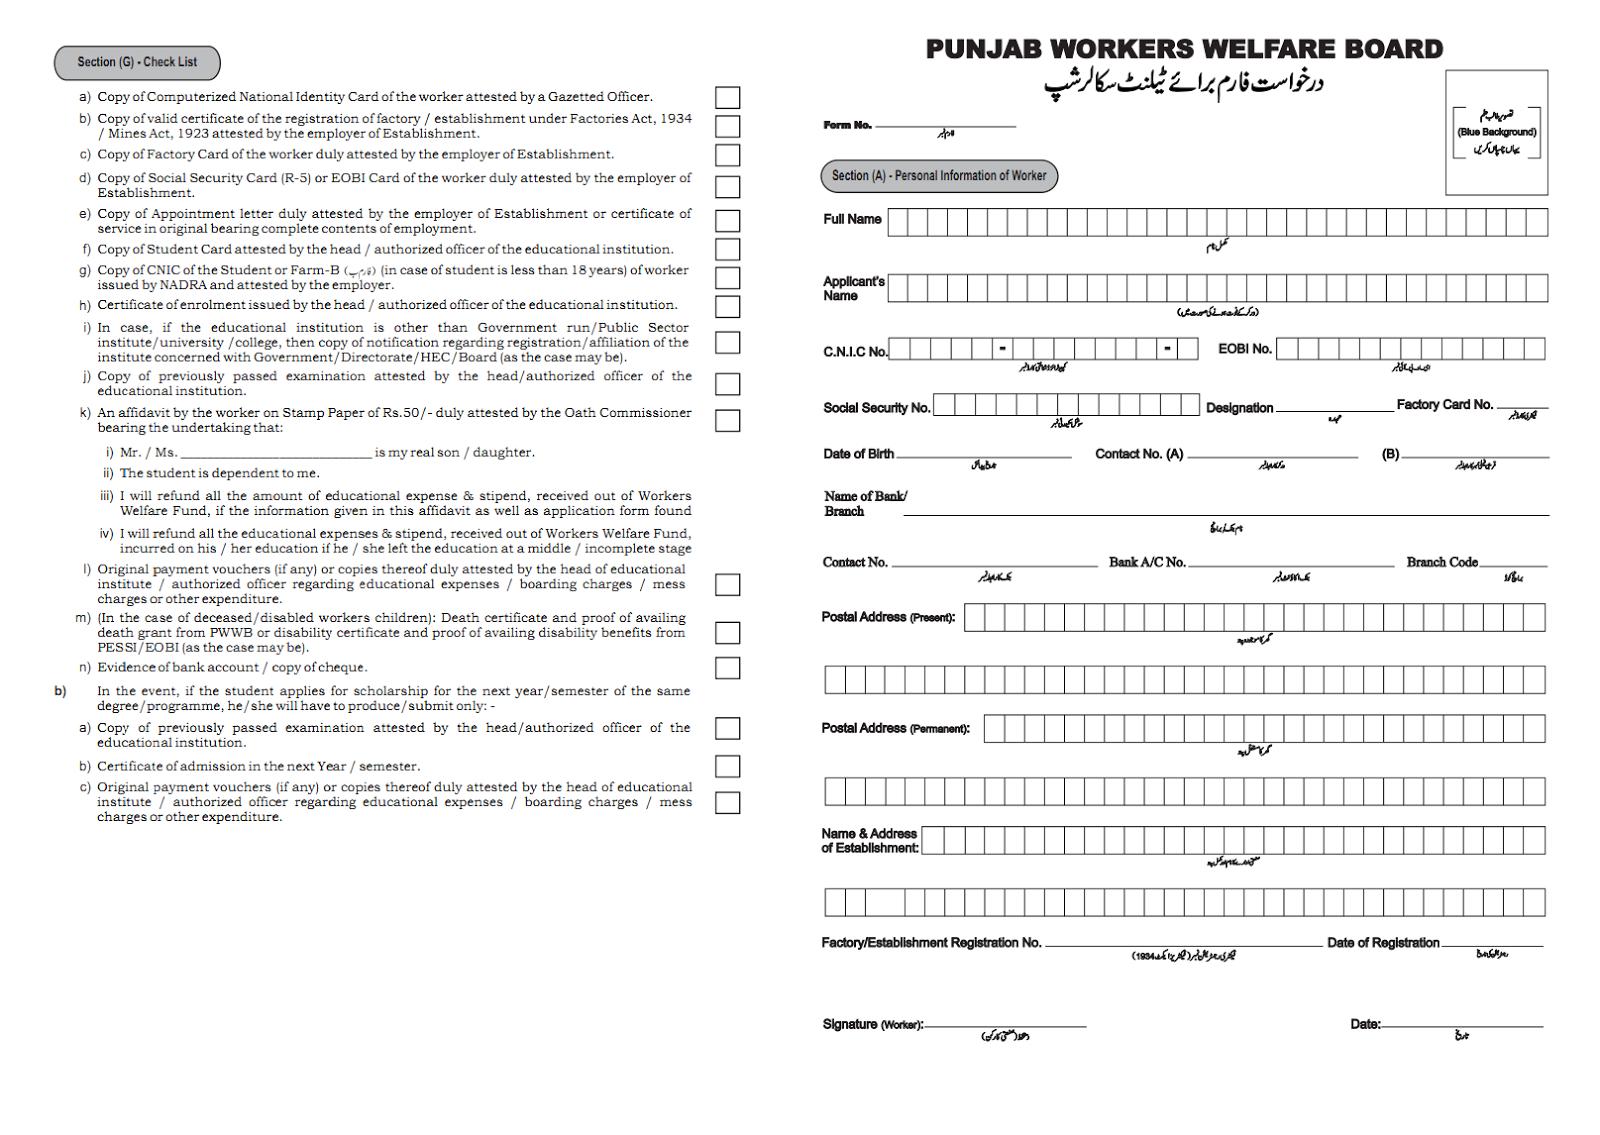 PUNJAB WORKERS WELFARE BOARD PAKISTAN TALLENT SCHOLARSHIP FORMS – Scholarship Form